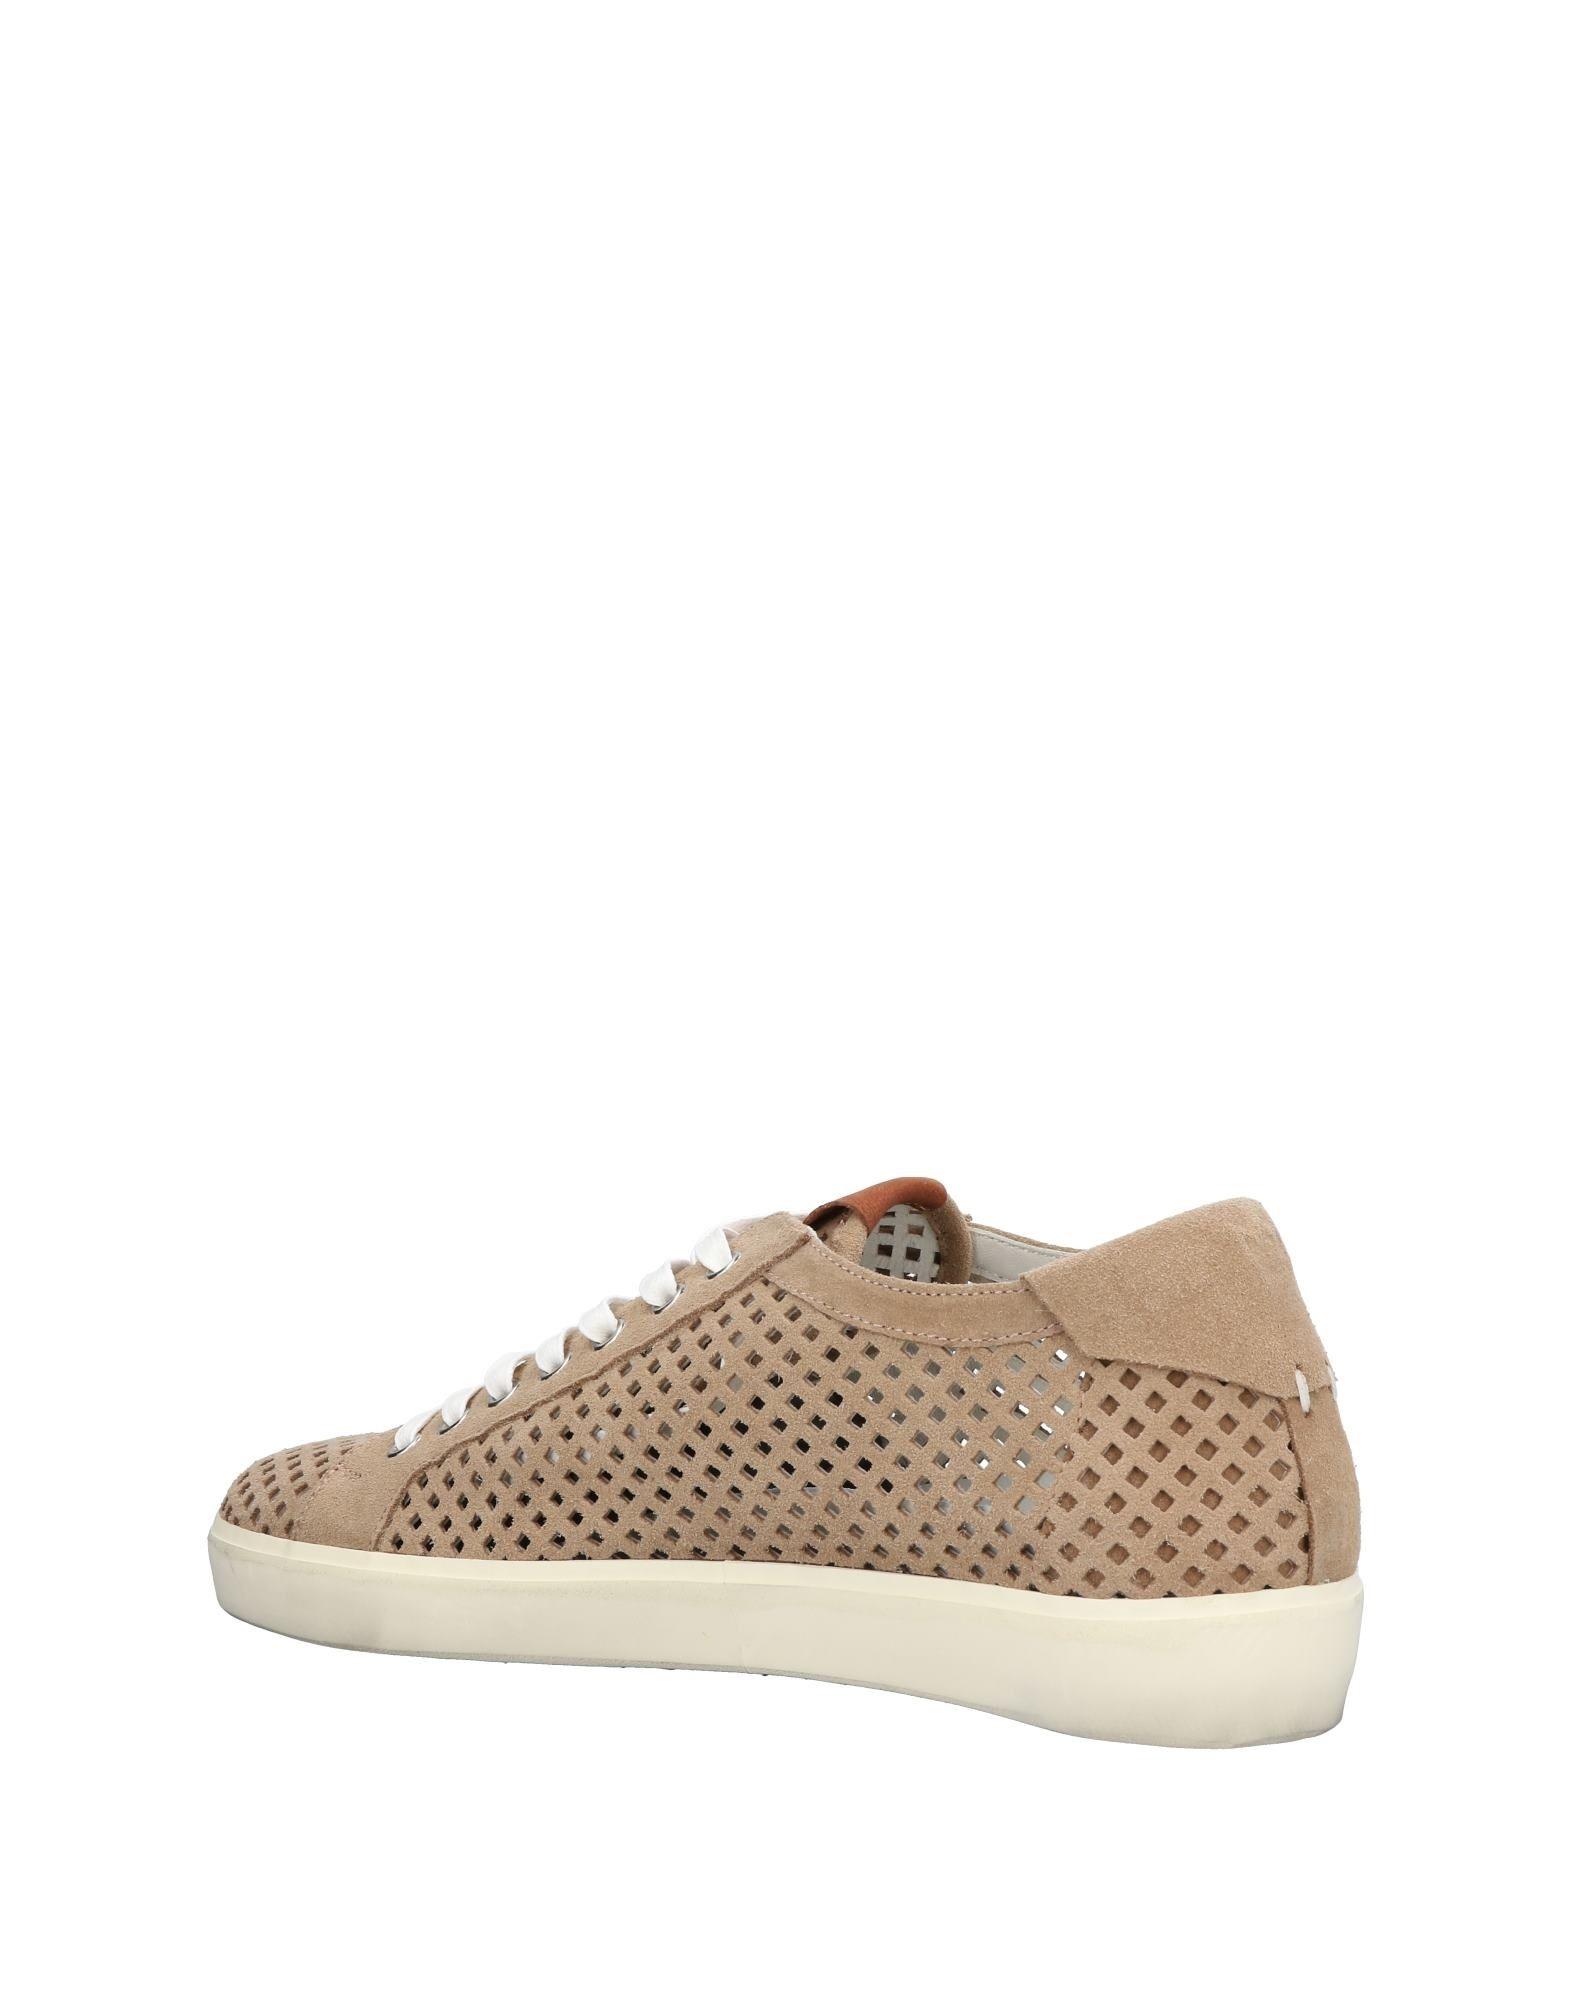 Leather Crown Sneakers - Men Men Men Leather Crown Sneakers online on  Canada - 11436698UA 9ec168